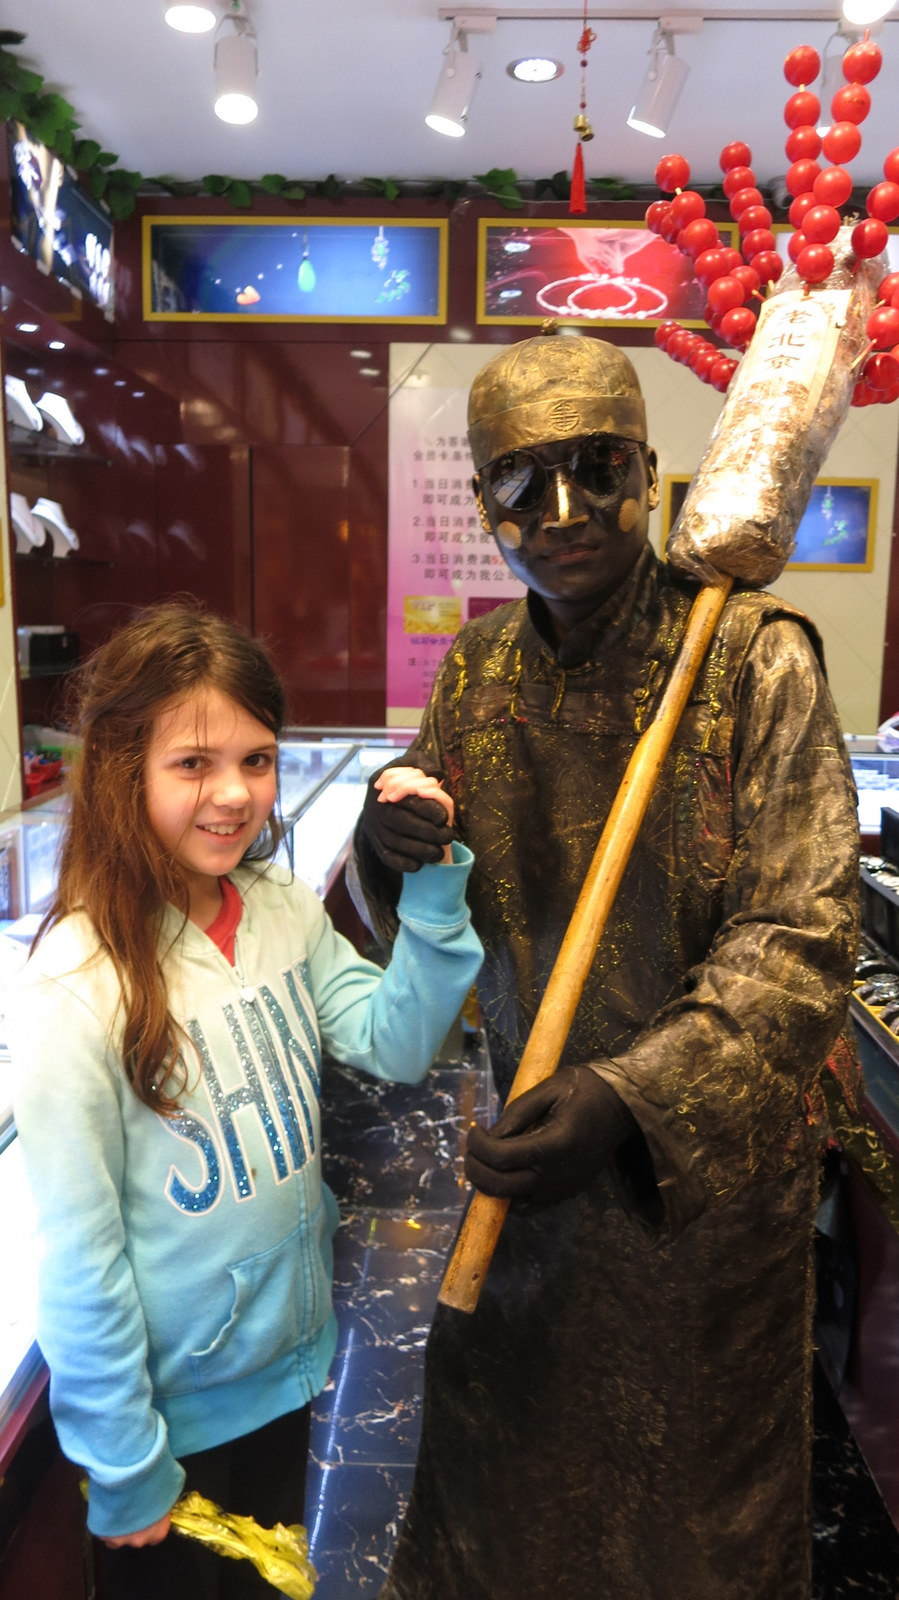 The freak statue man that stalked Abigail through the store.